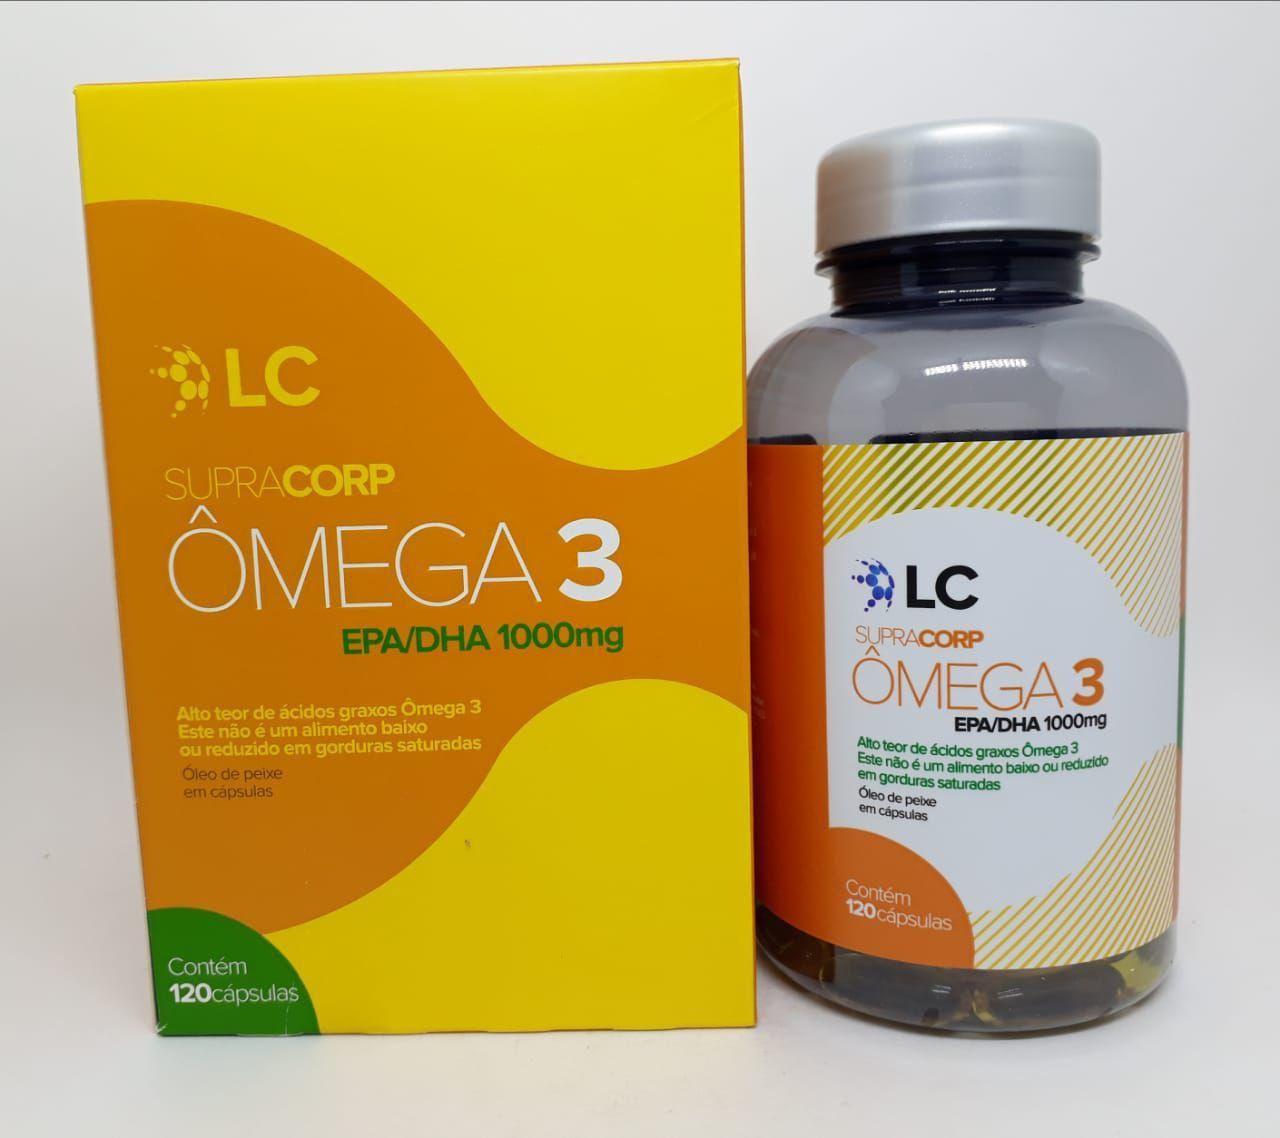 Lipocorp Ômega 3 1000 Mg com 120 Cápsulas